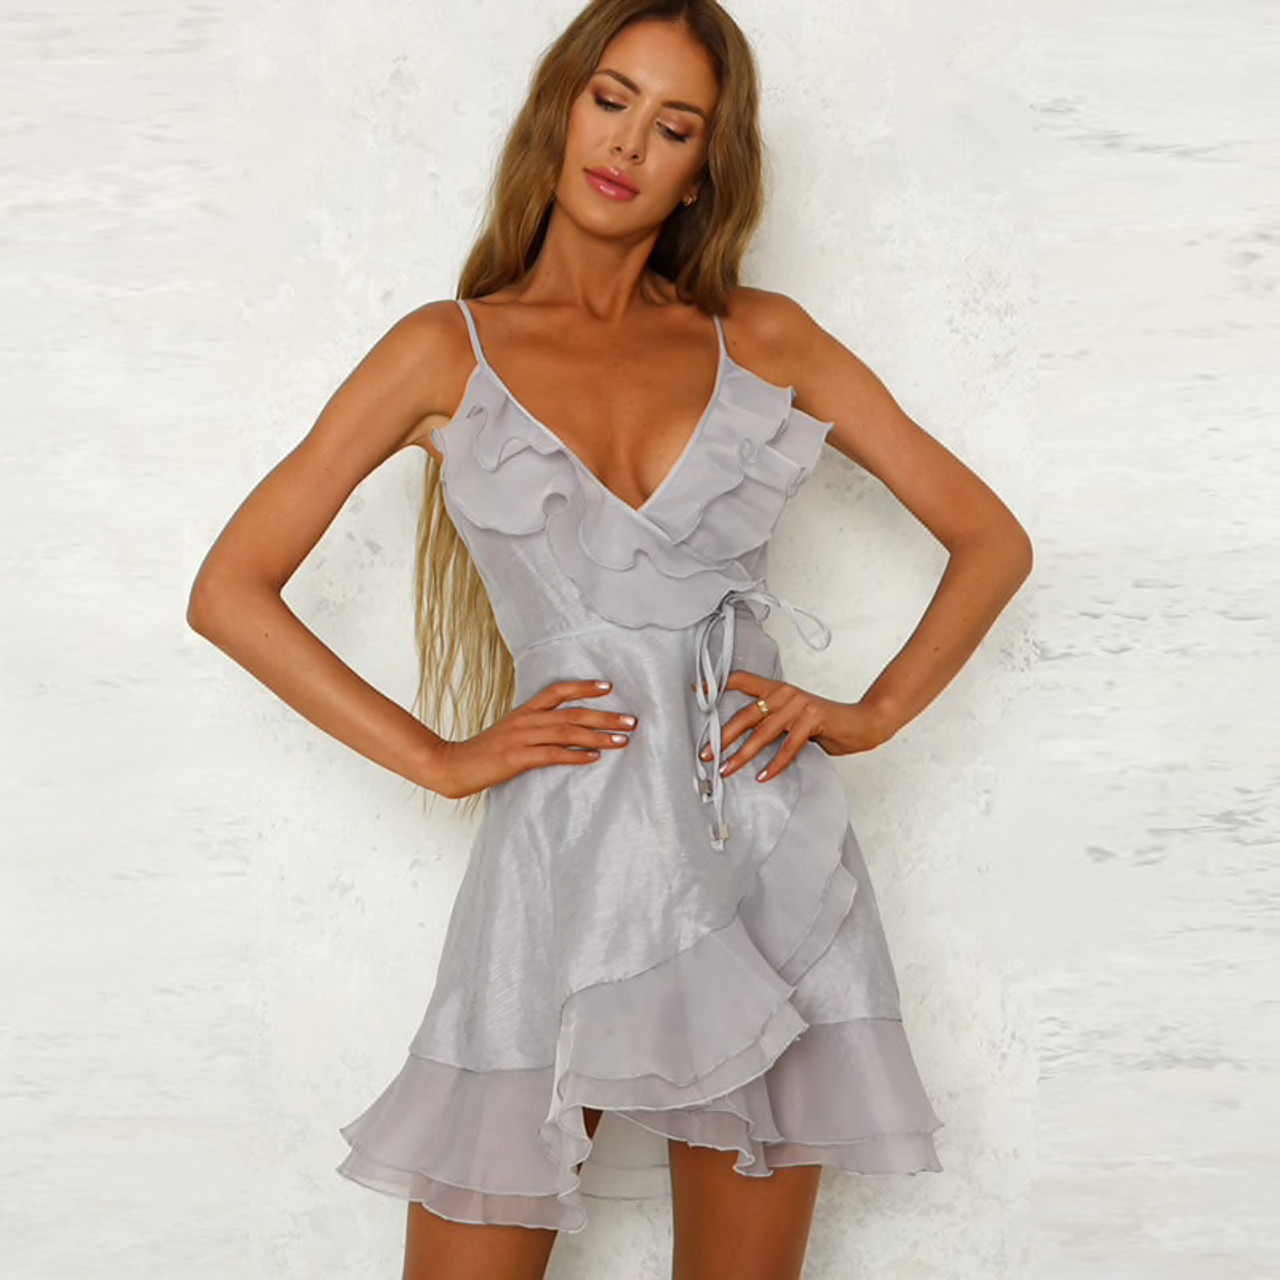 2235d70717 Woman Beach Summer Dress 2018 Elegant Ruffle Organza Dress Women V Neck  Sleeveless Spaghetti Strap Casual Mini Wrap ...